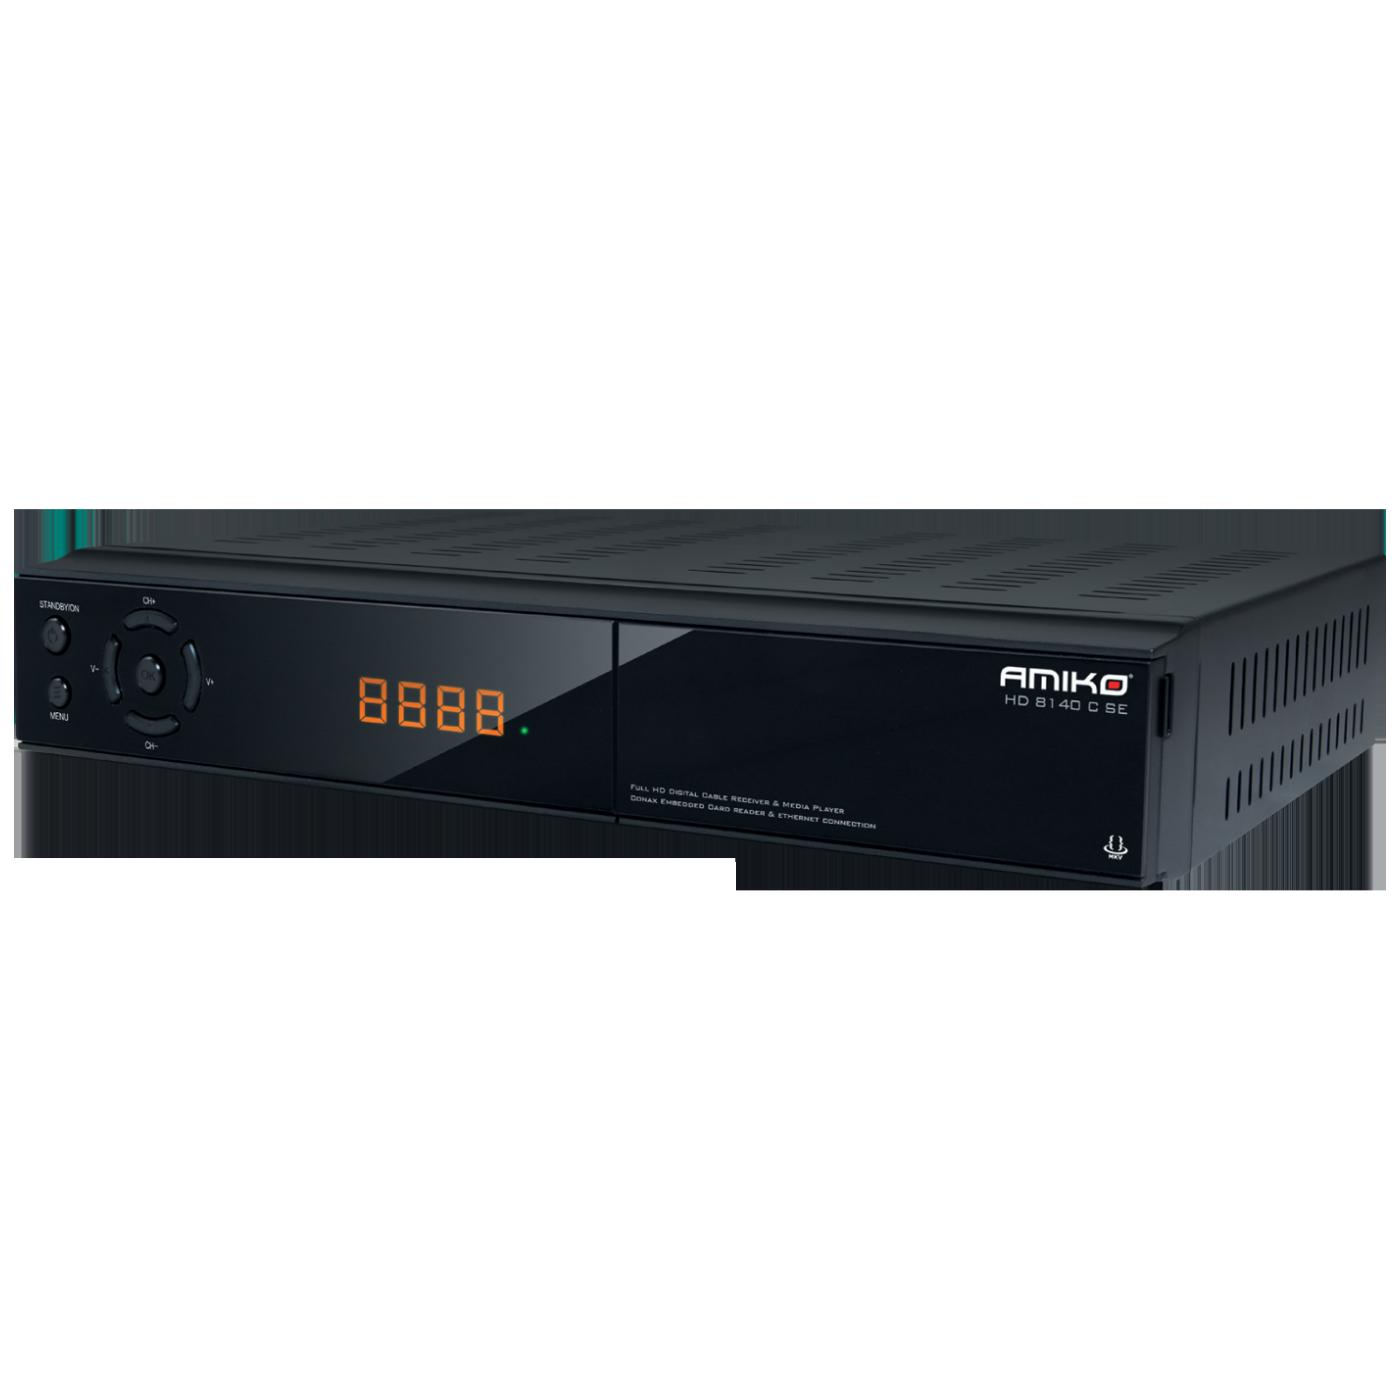 HD 8140 C SE